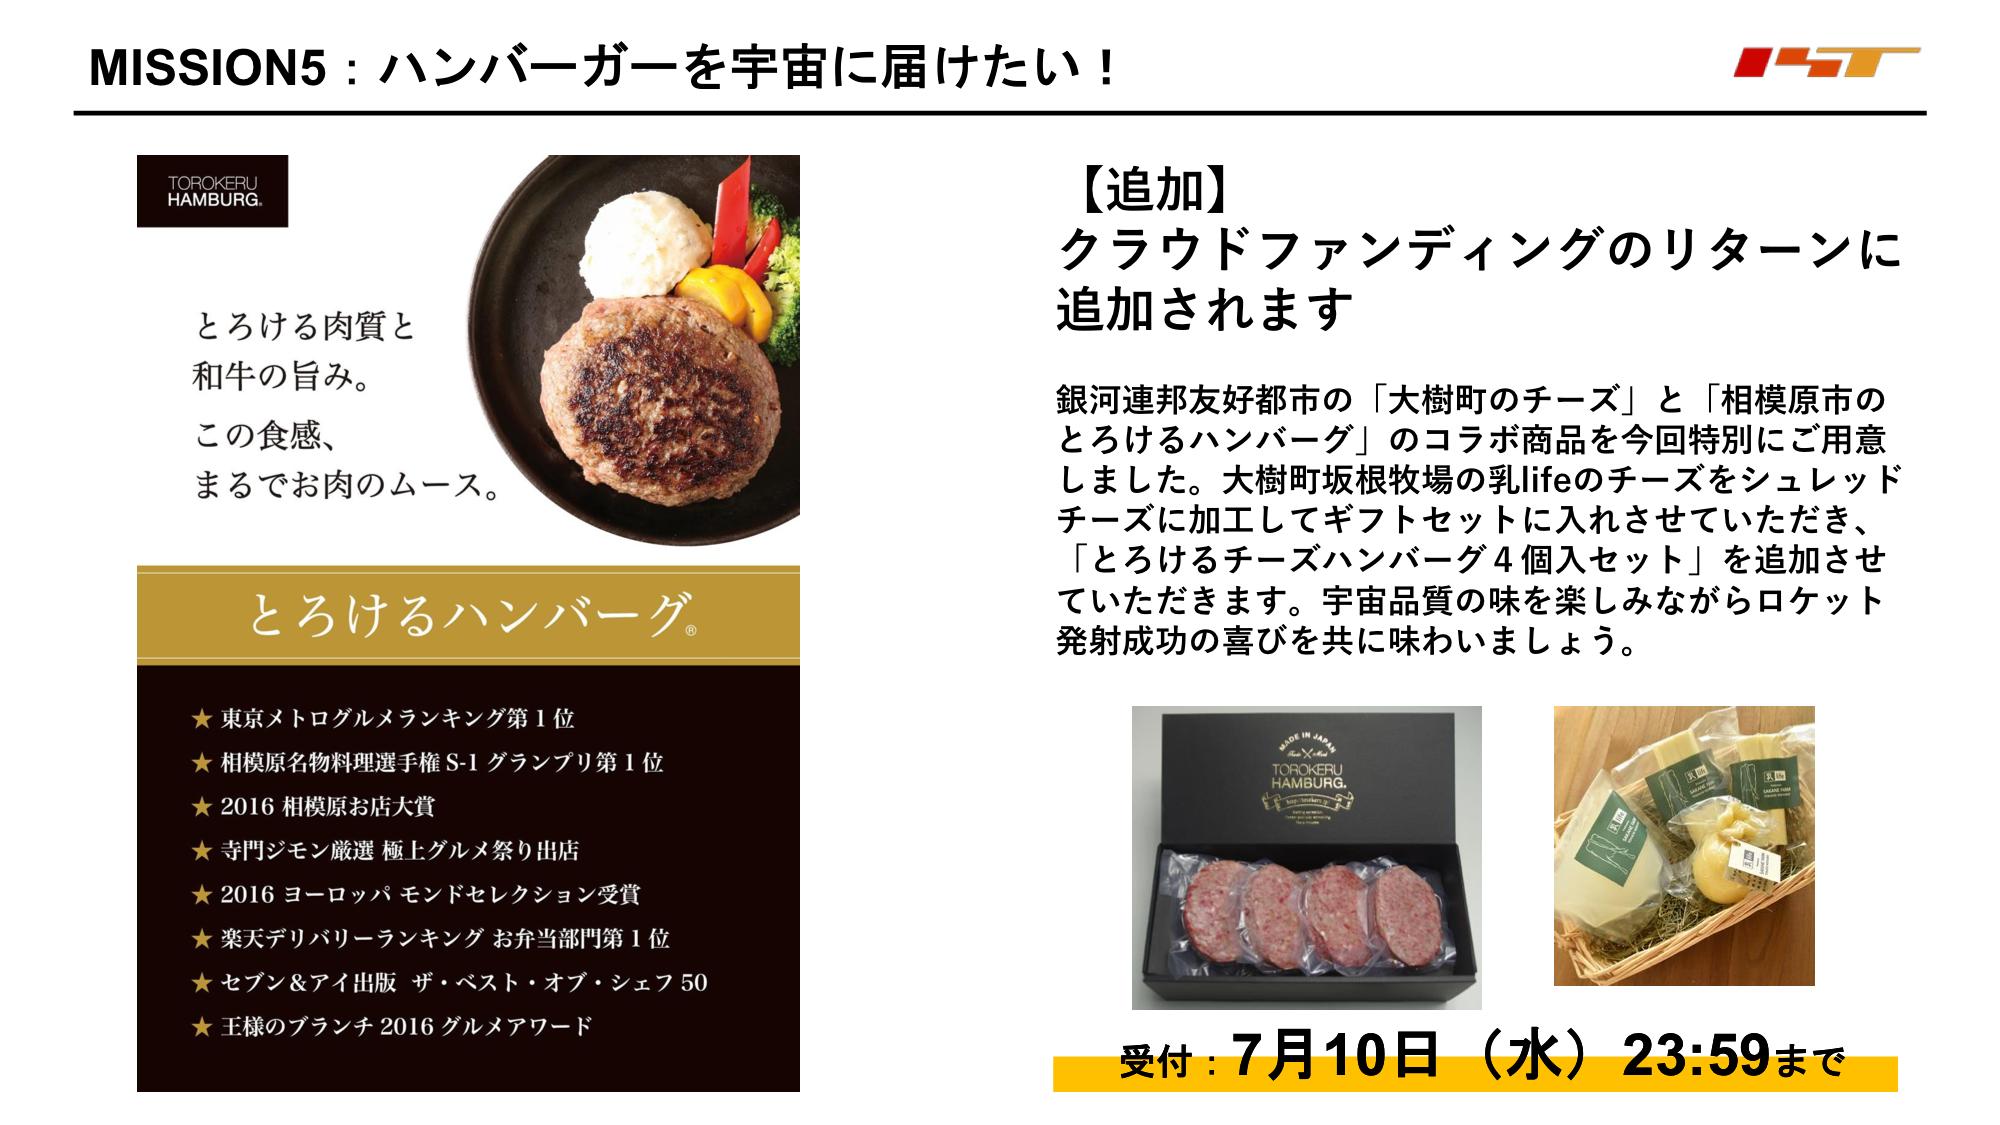 f:id:Imamura:20190628161329p:plain